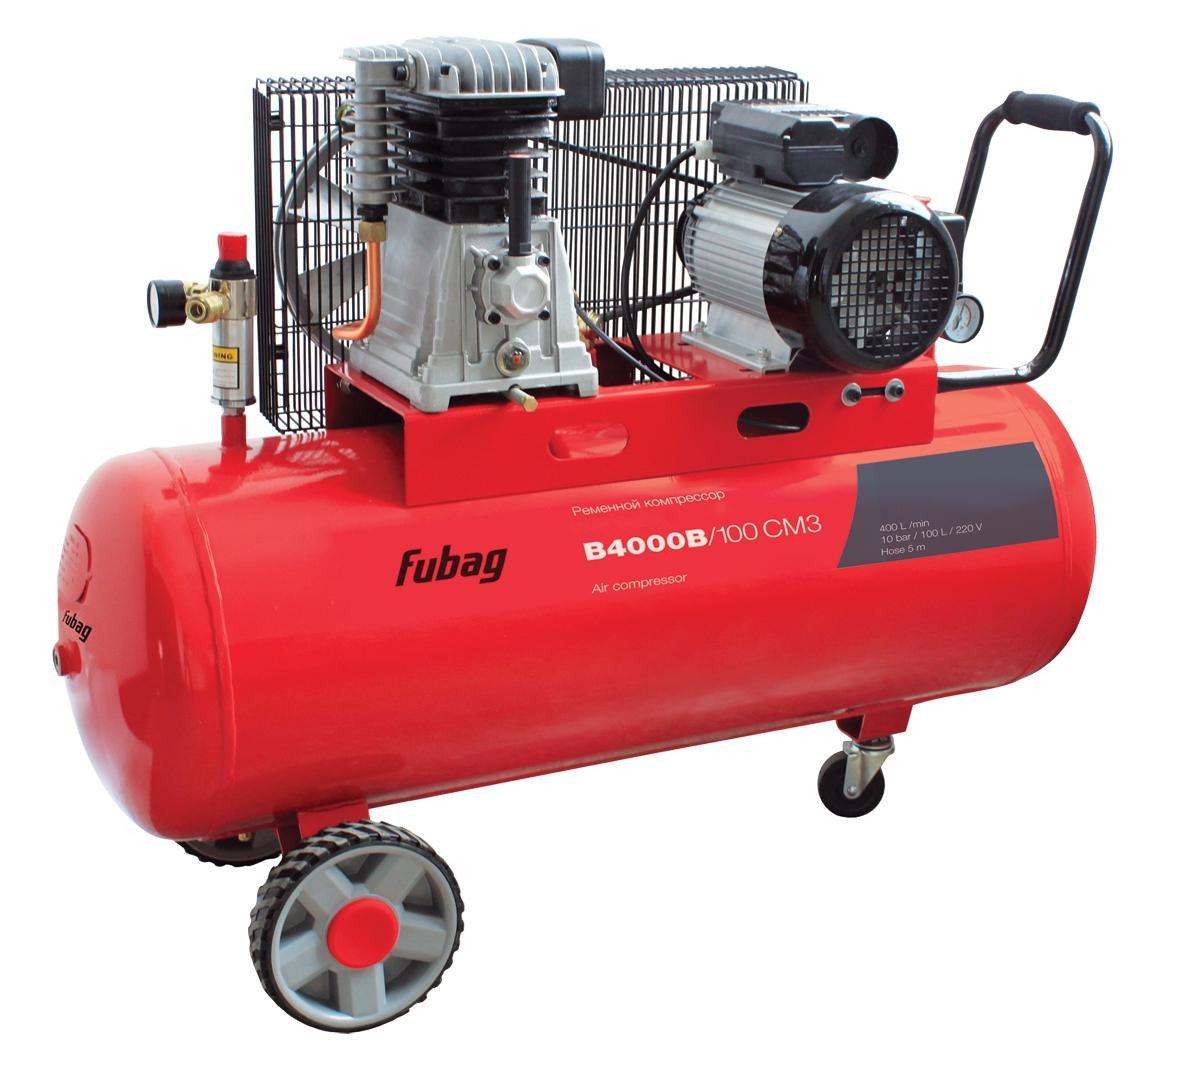 Компрессор Fubag B4000b/100 СМ3